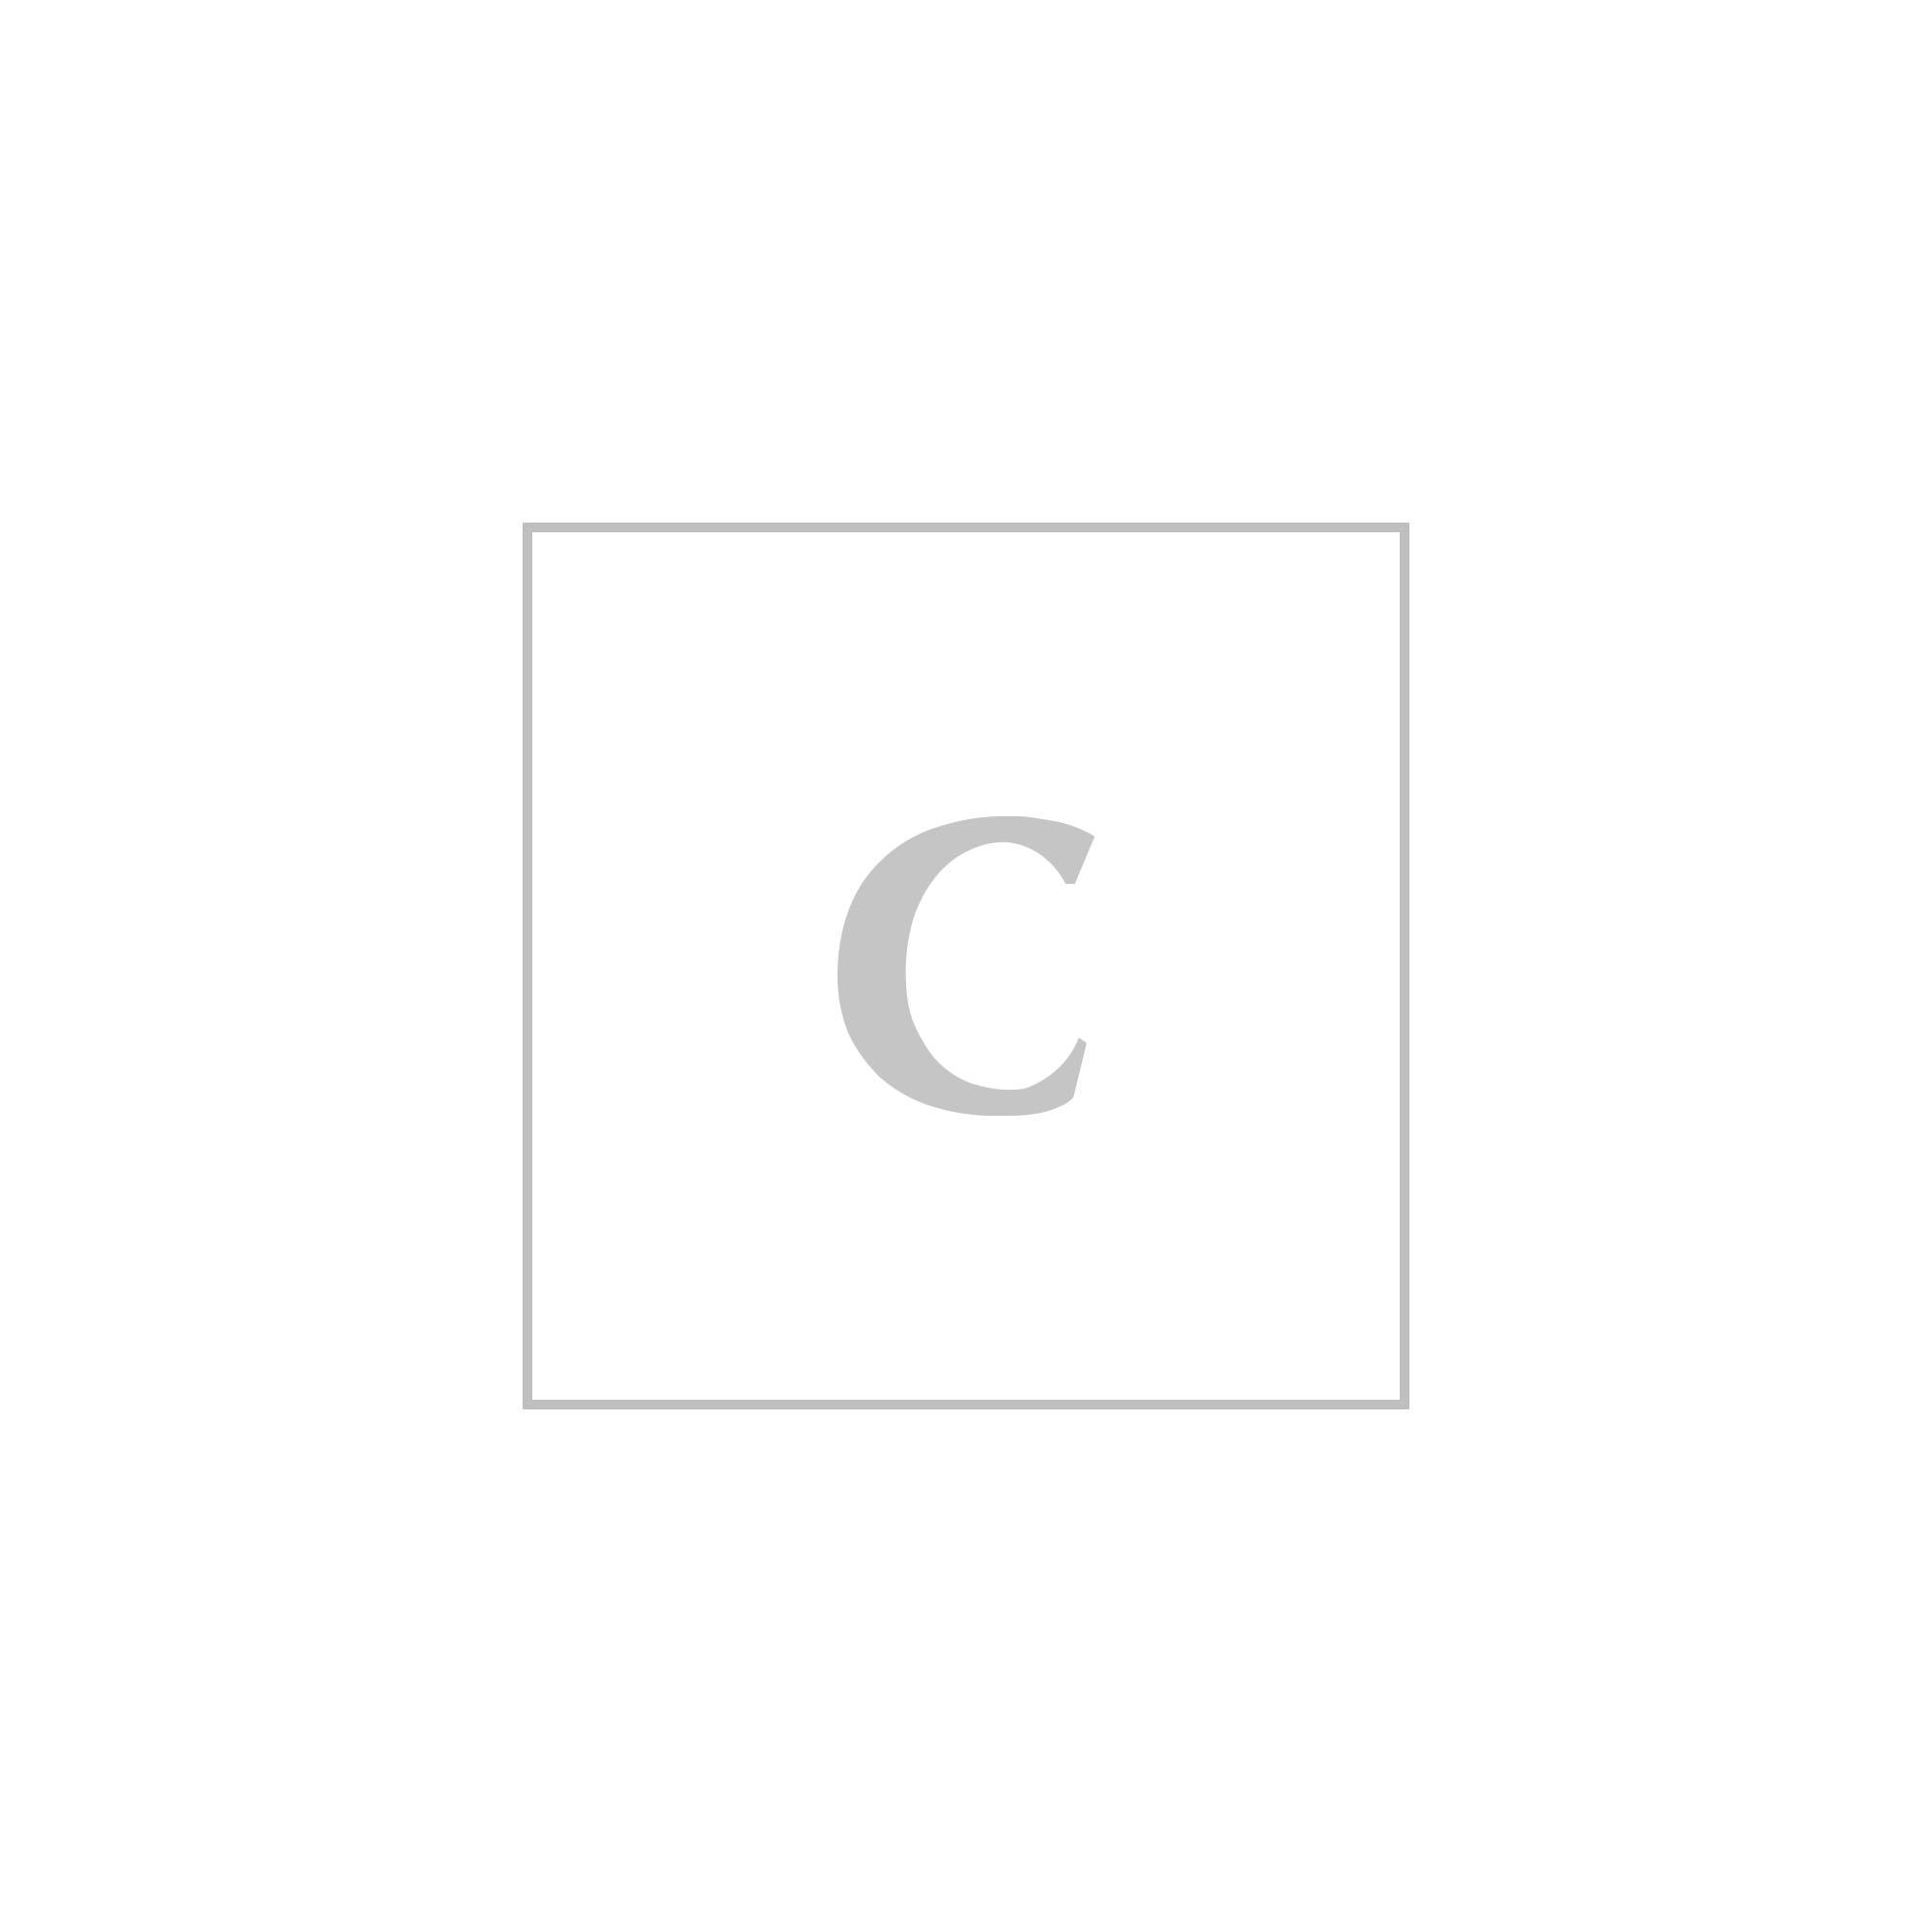 Burberry borsa medium clifton